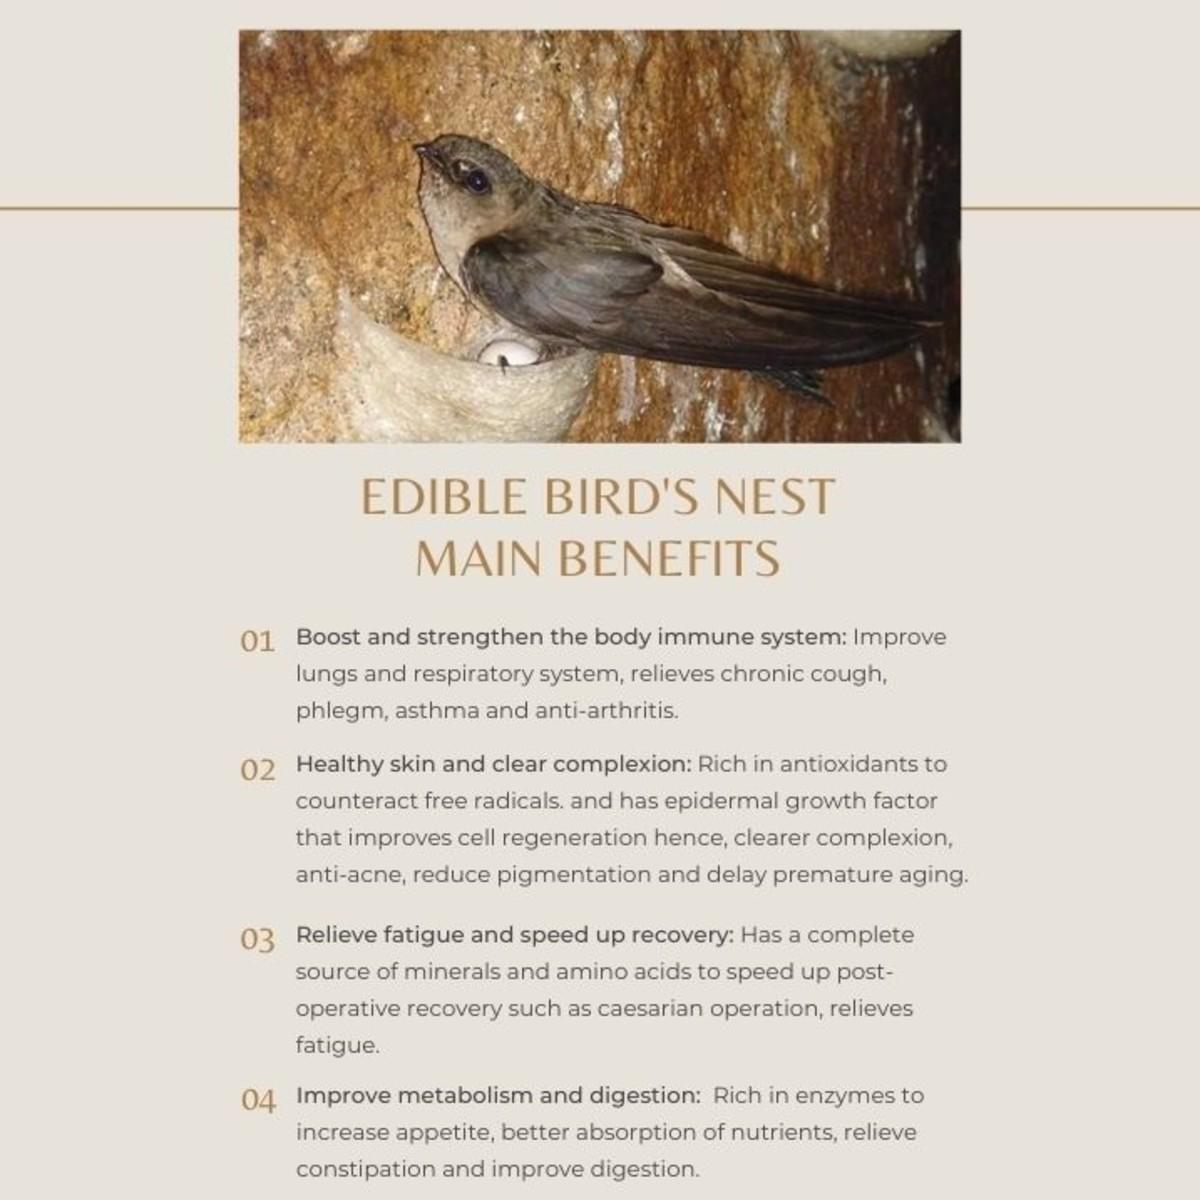 Main benefits of edible bird's nest